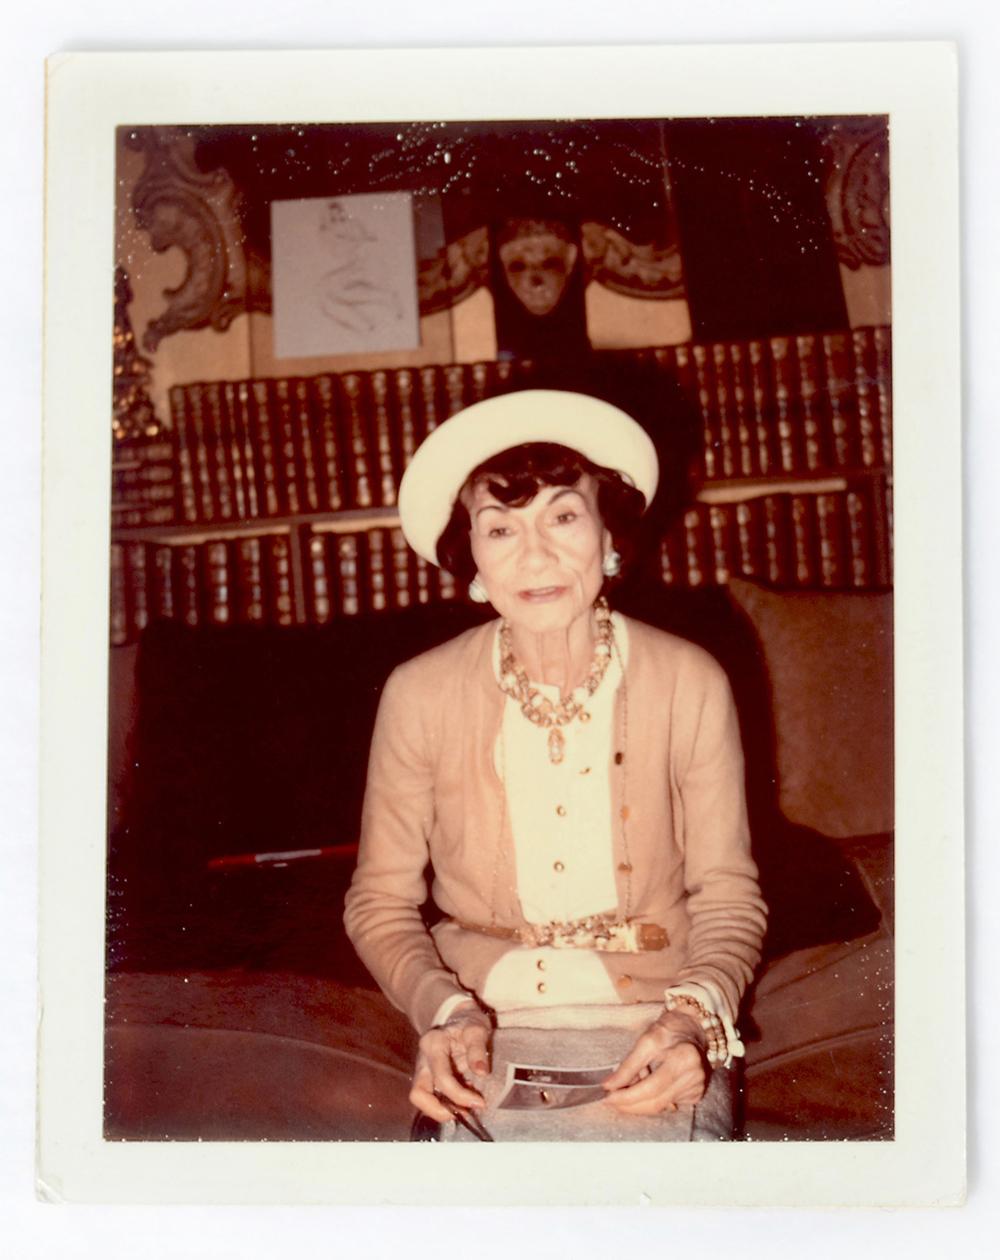 Coco Chanel - photographic portrait